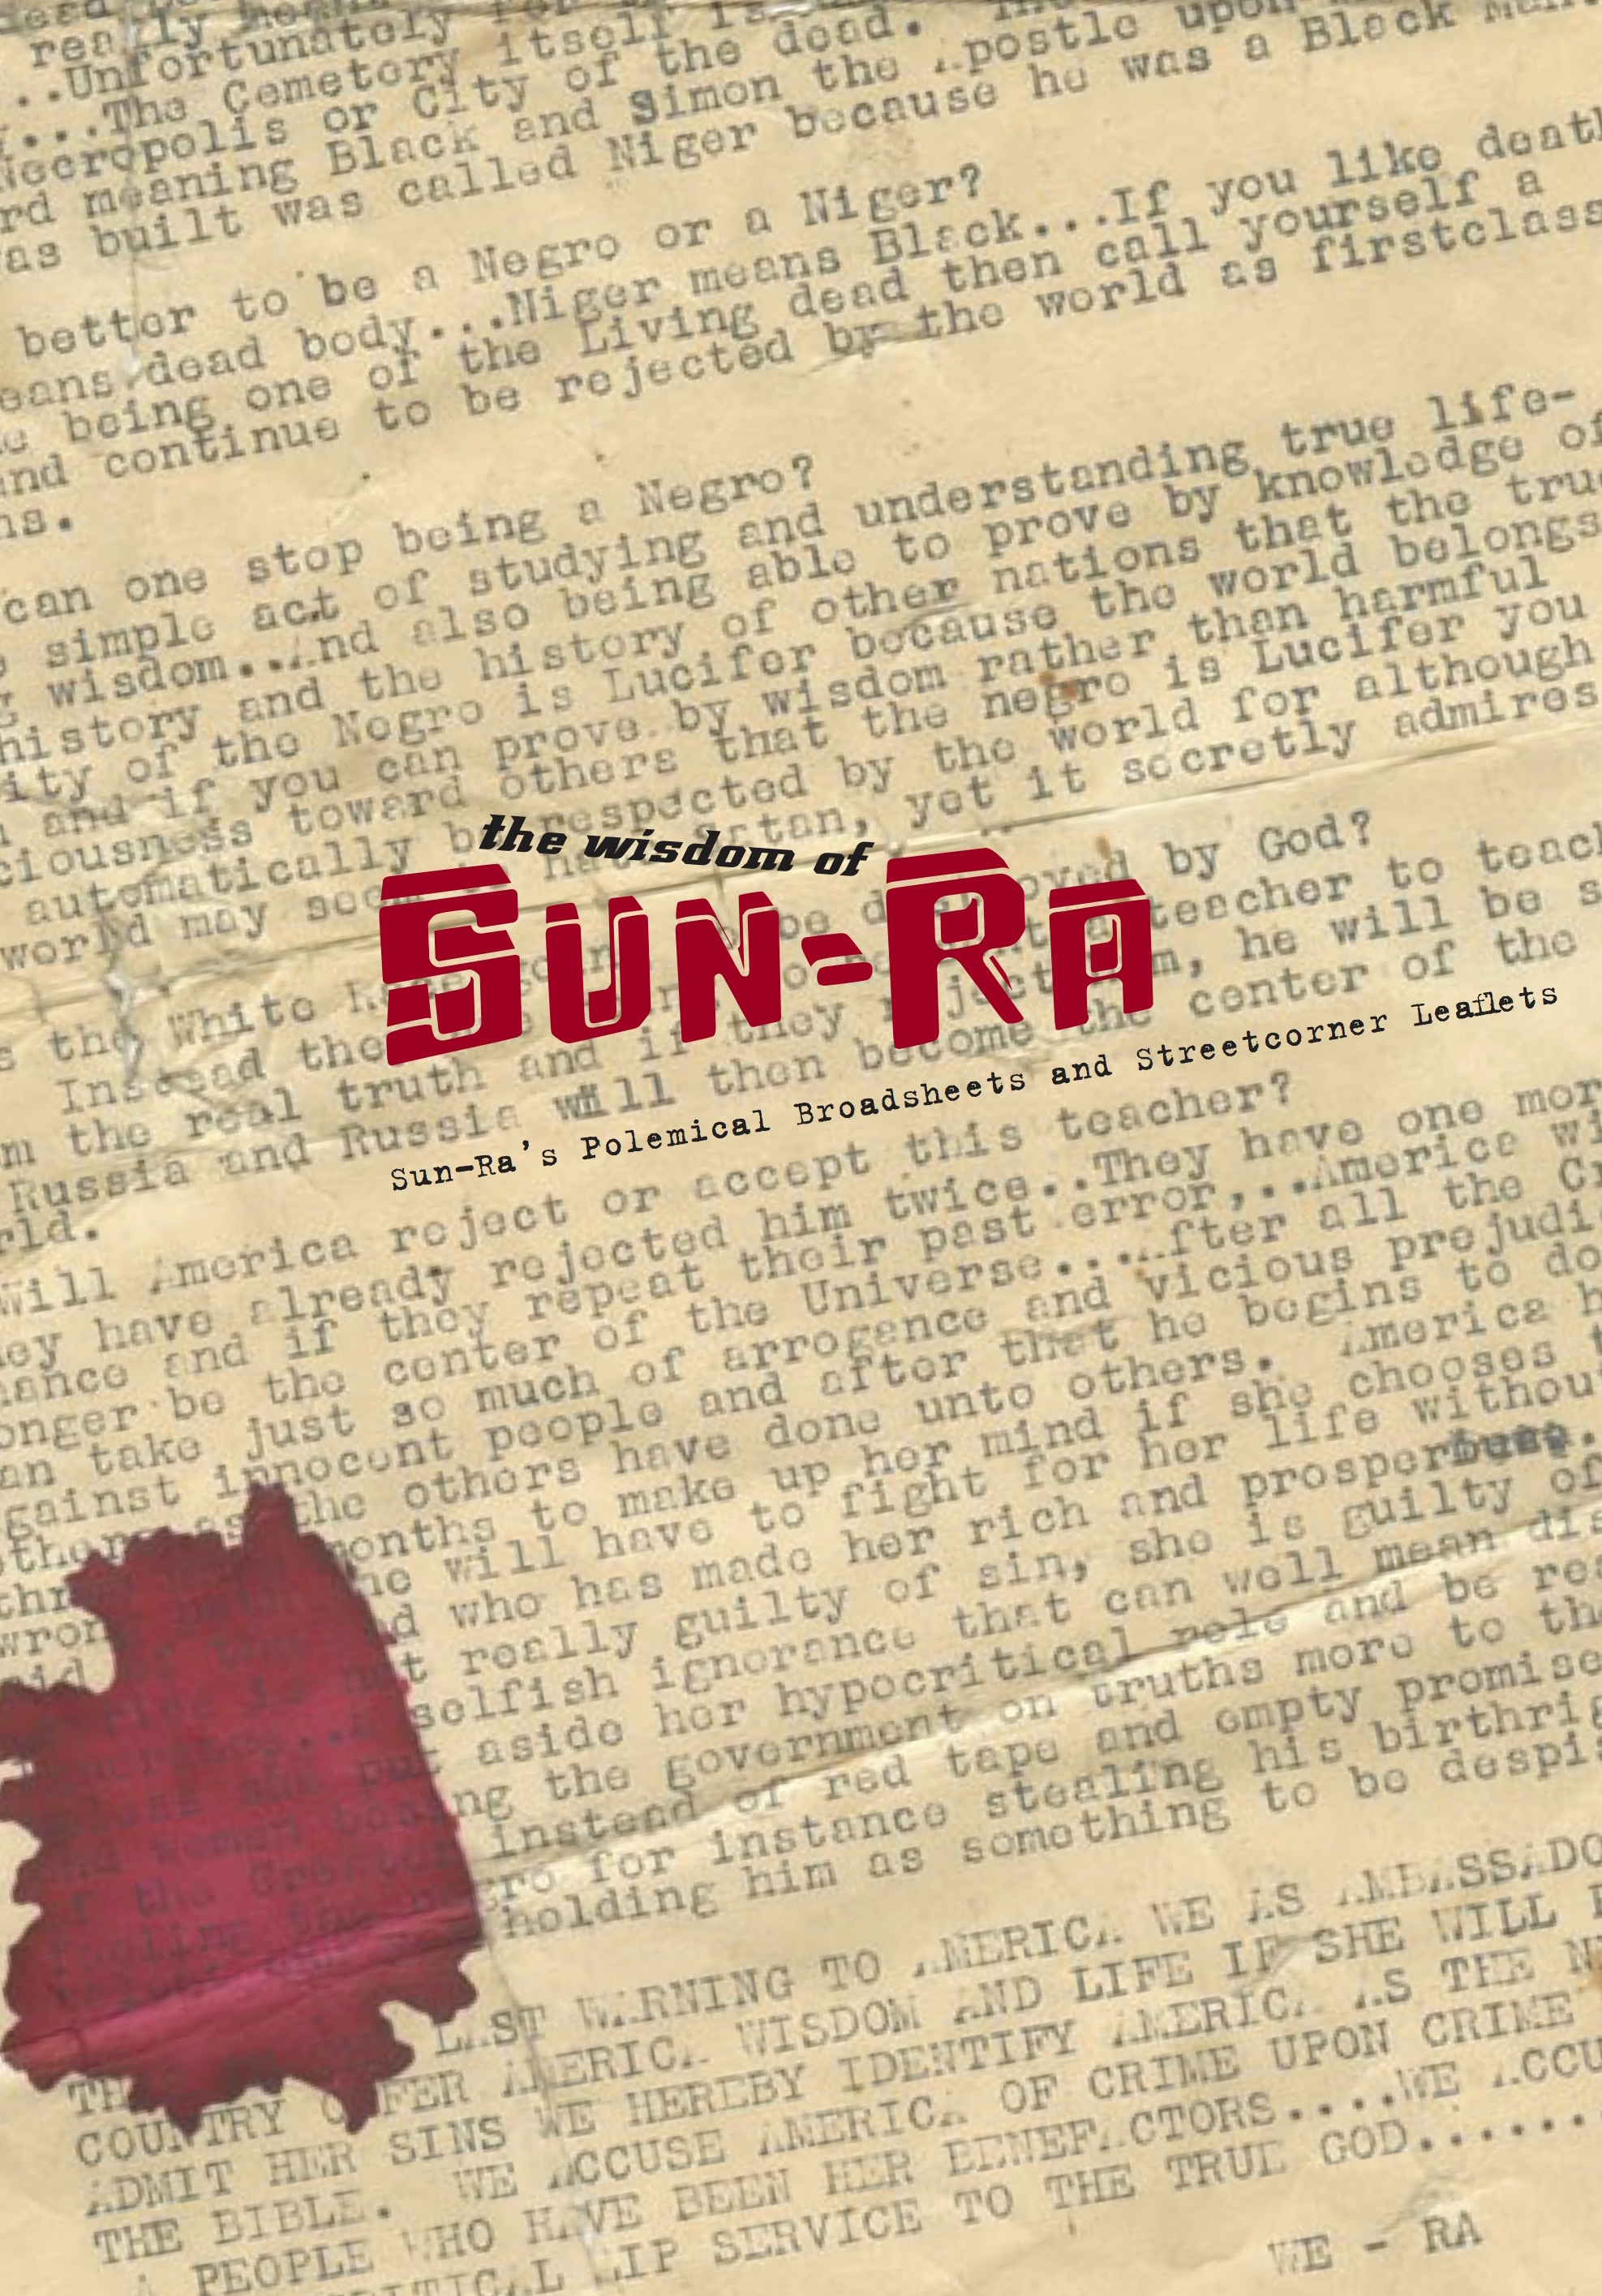 The Wisdom of Sun Ra: Sun Ra's Polemical Broadsheets and Streetcorner Leaflets